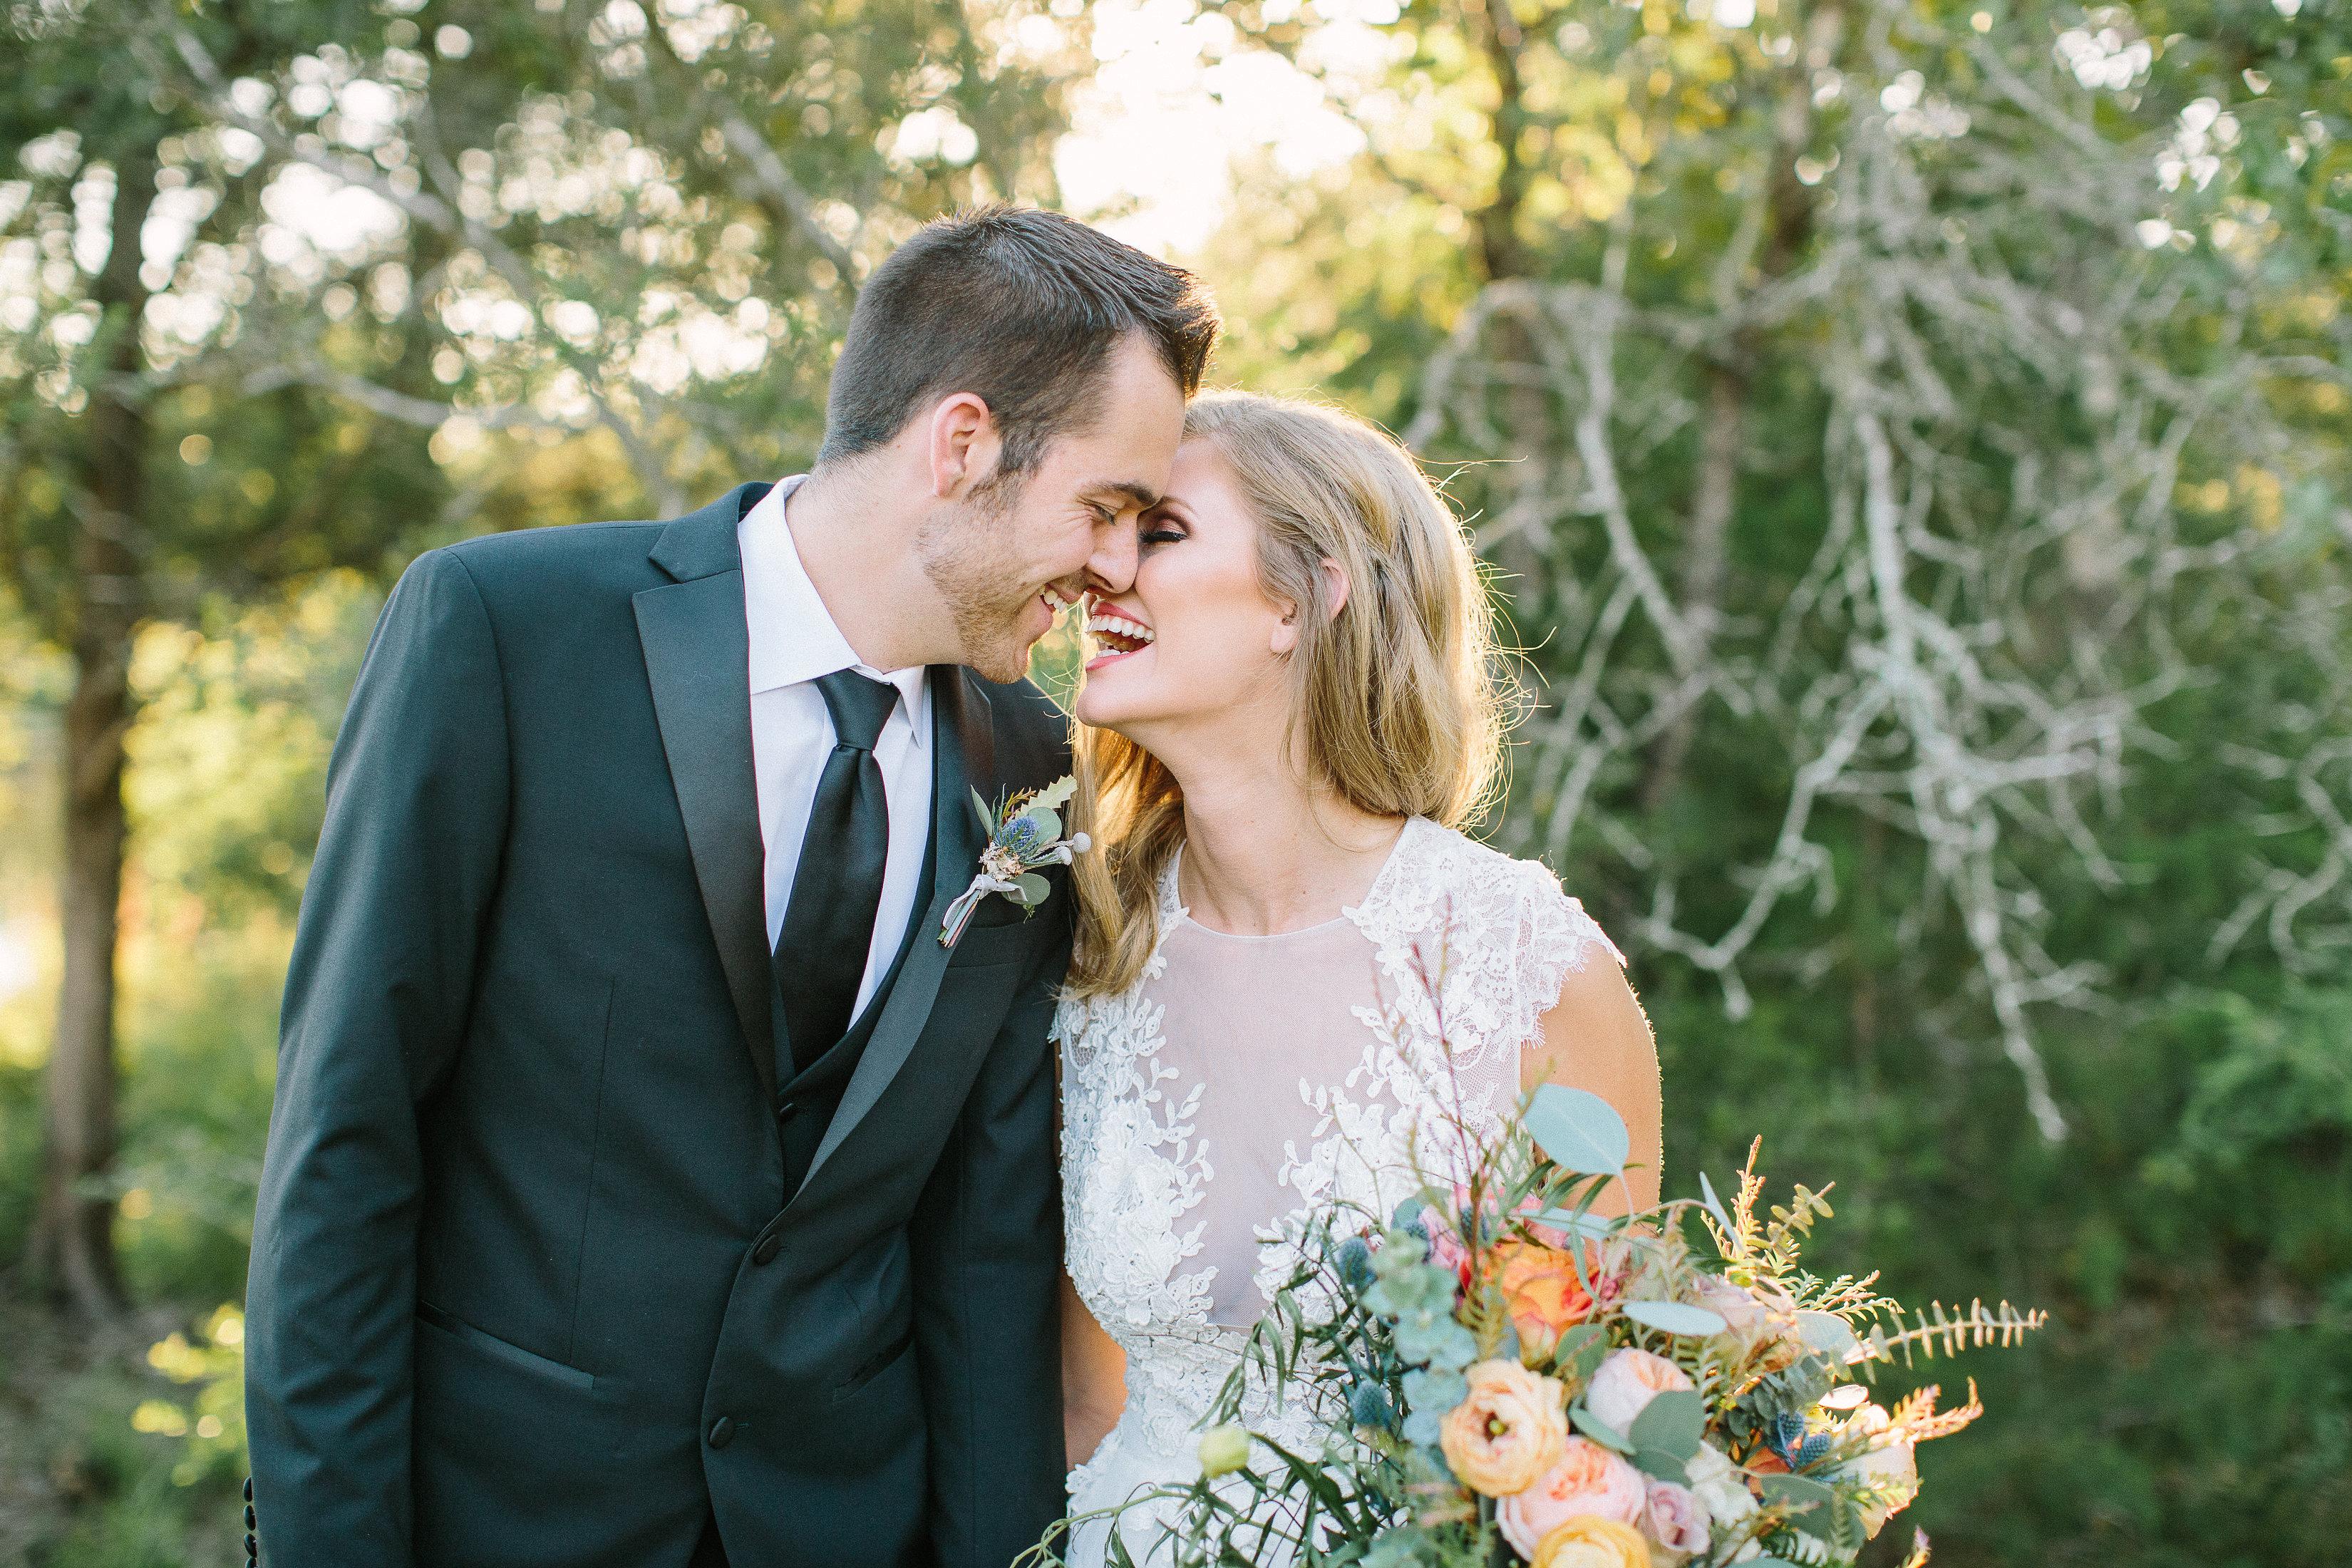 Ellen-Ashton-Photography-Peach-Creek-Ranch-Weddings-Wed-and-Prosper286